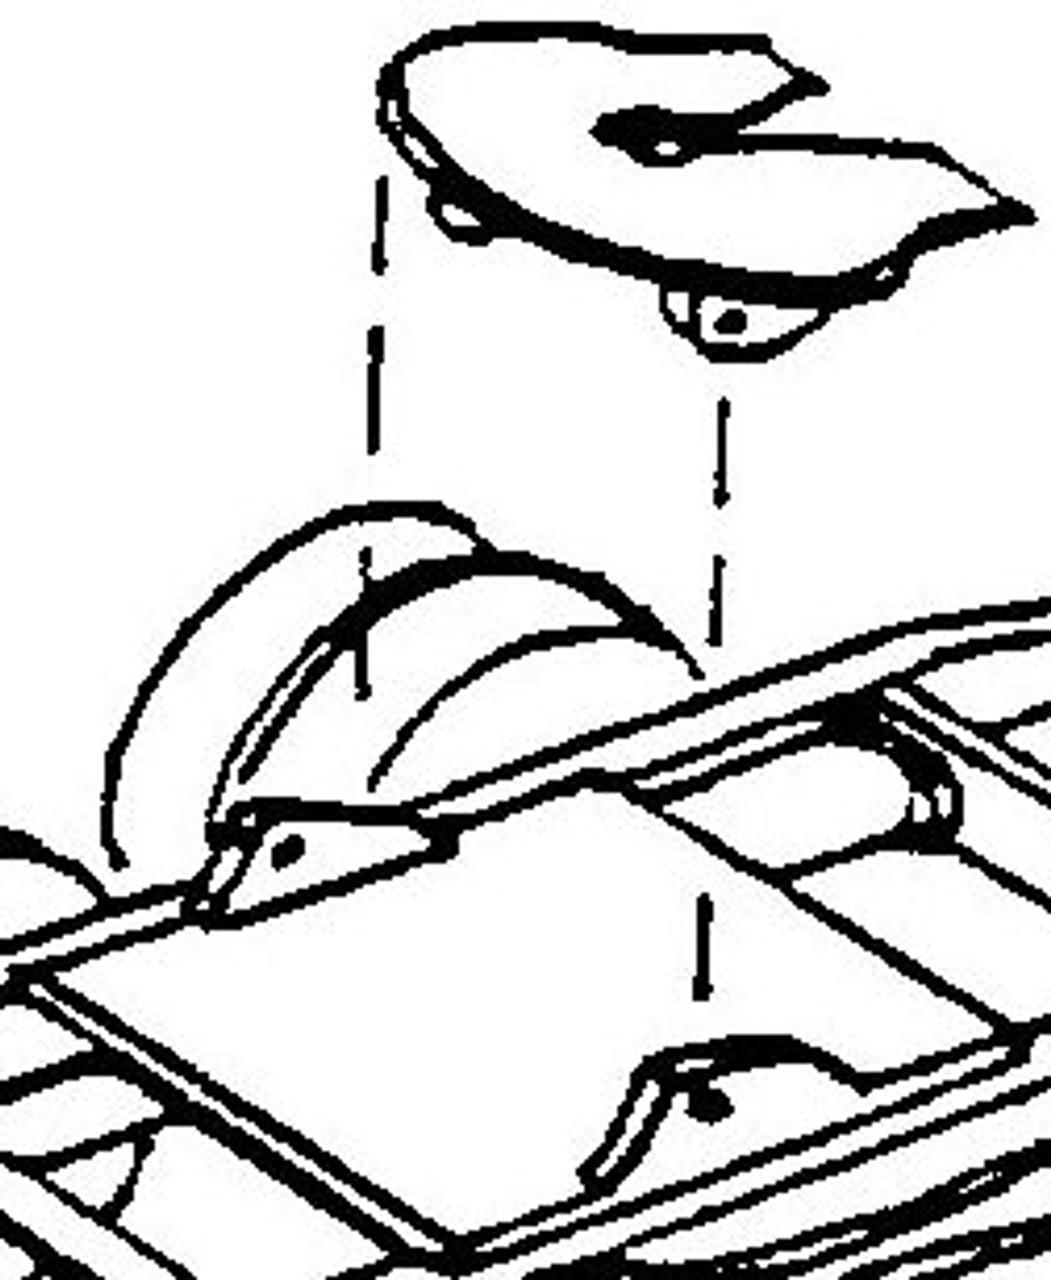 Pivoting Fifth Wheel Plate & Base Kit